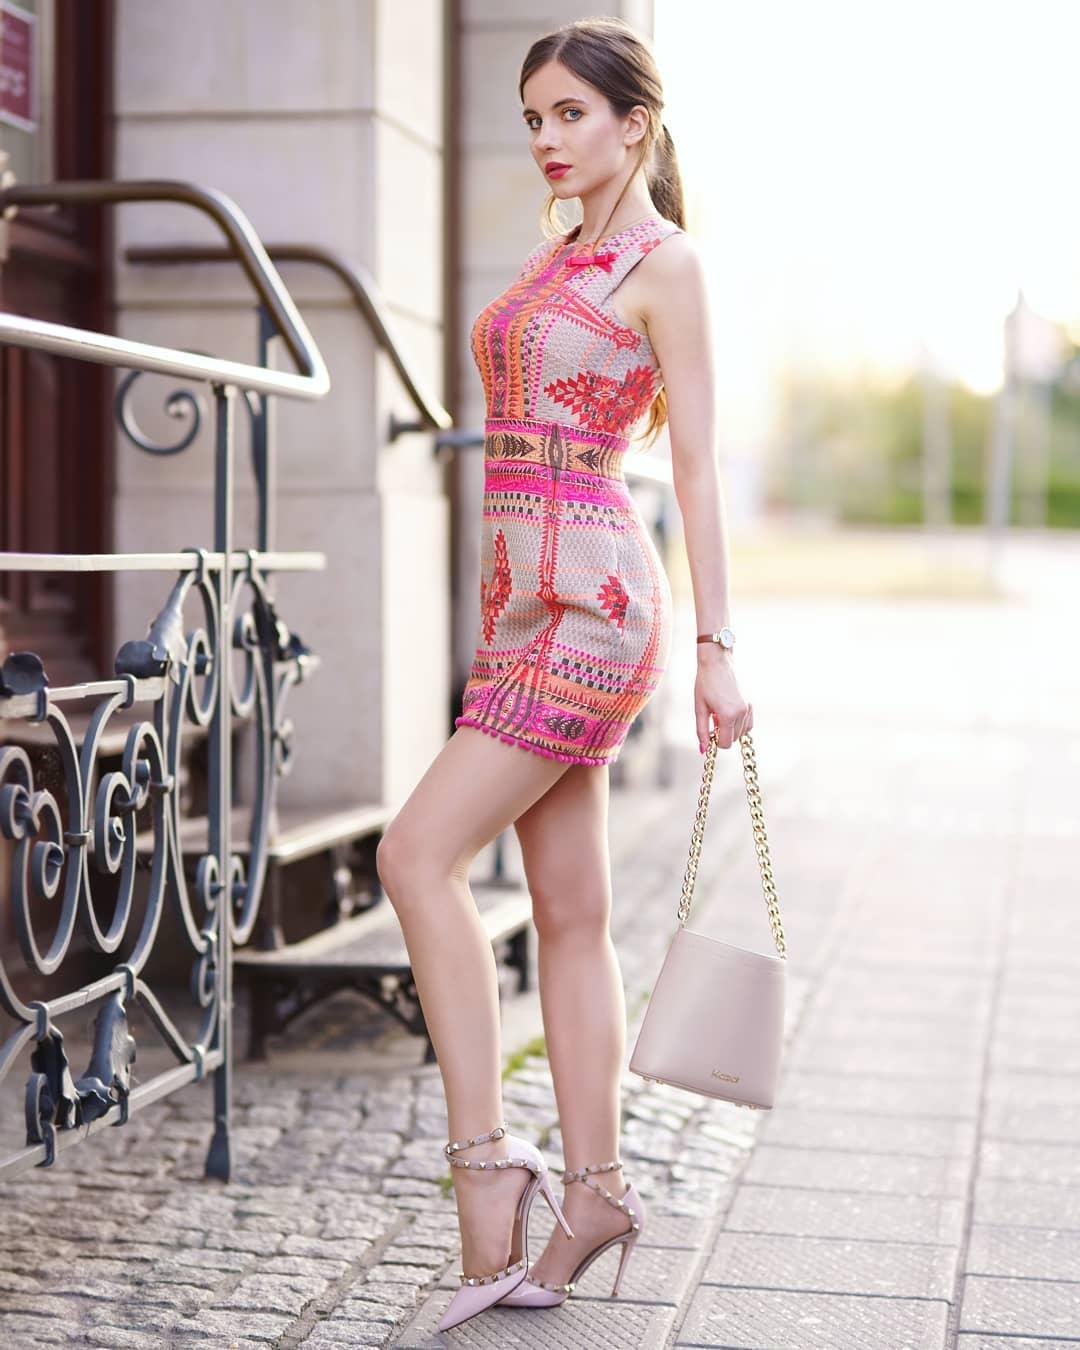 Ariadna-Majewska-Wallpapers-Insta-Biography-11